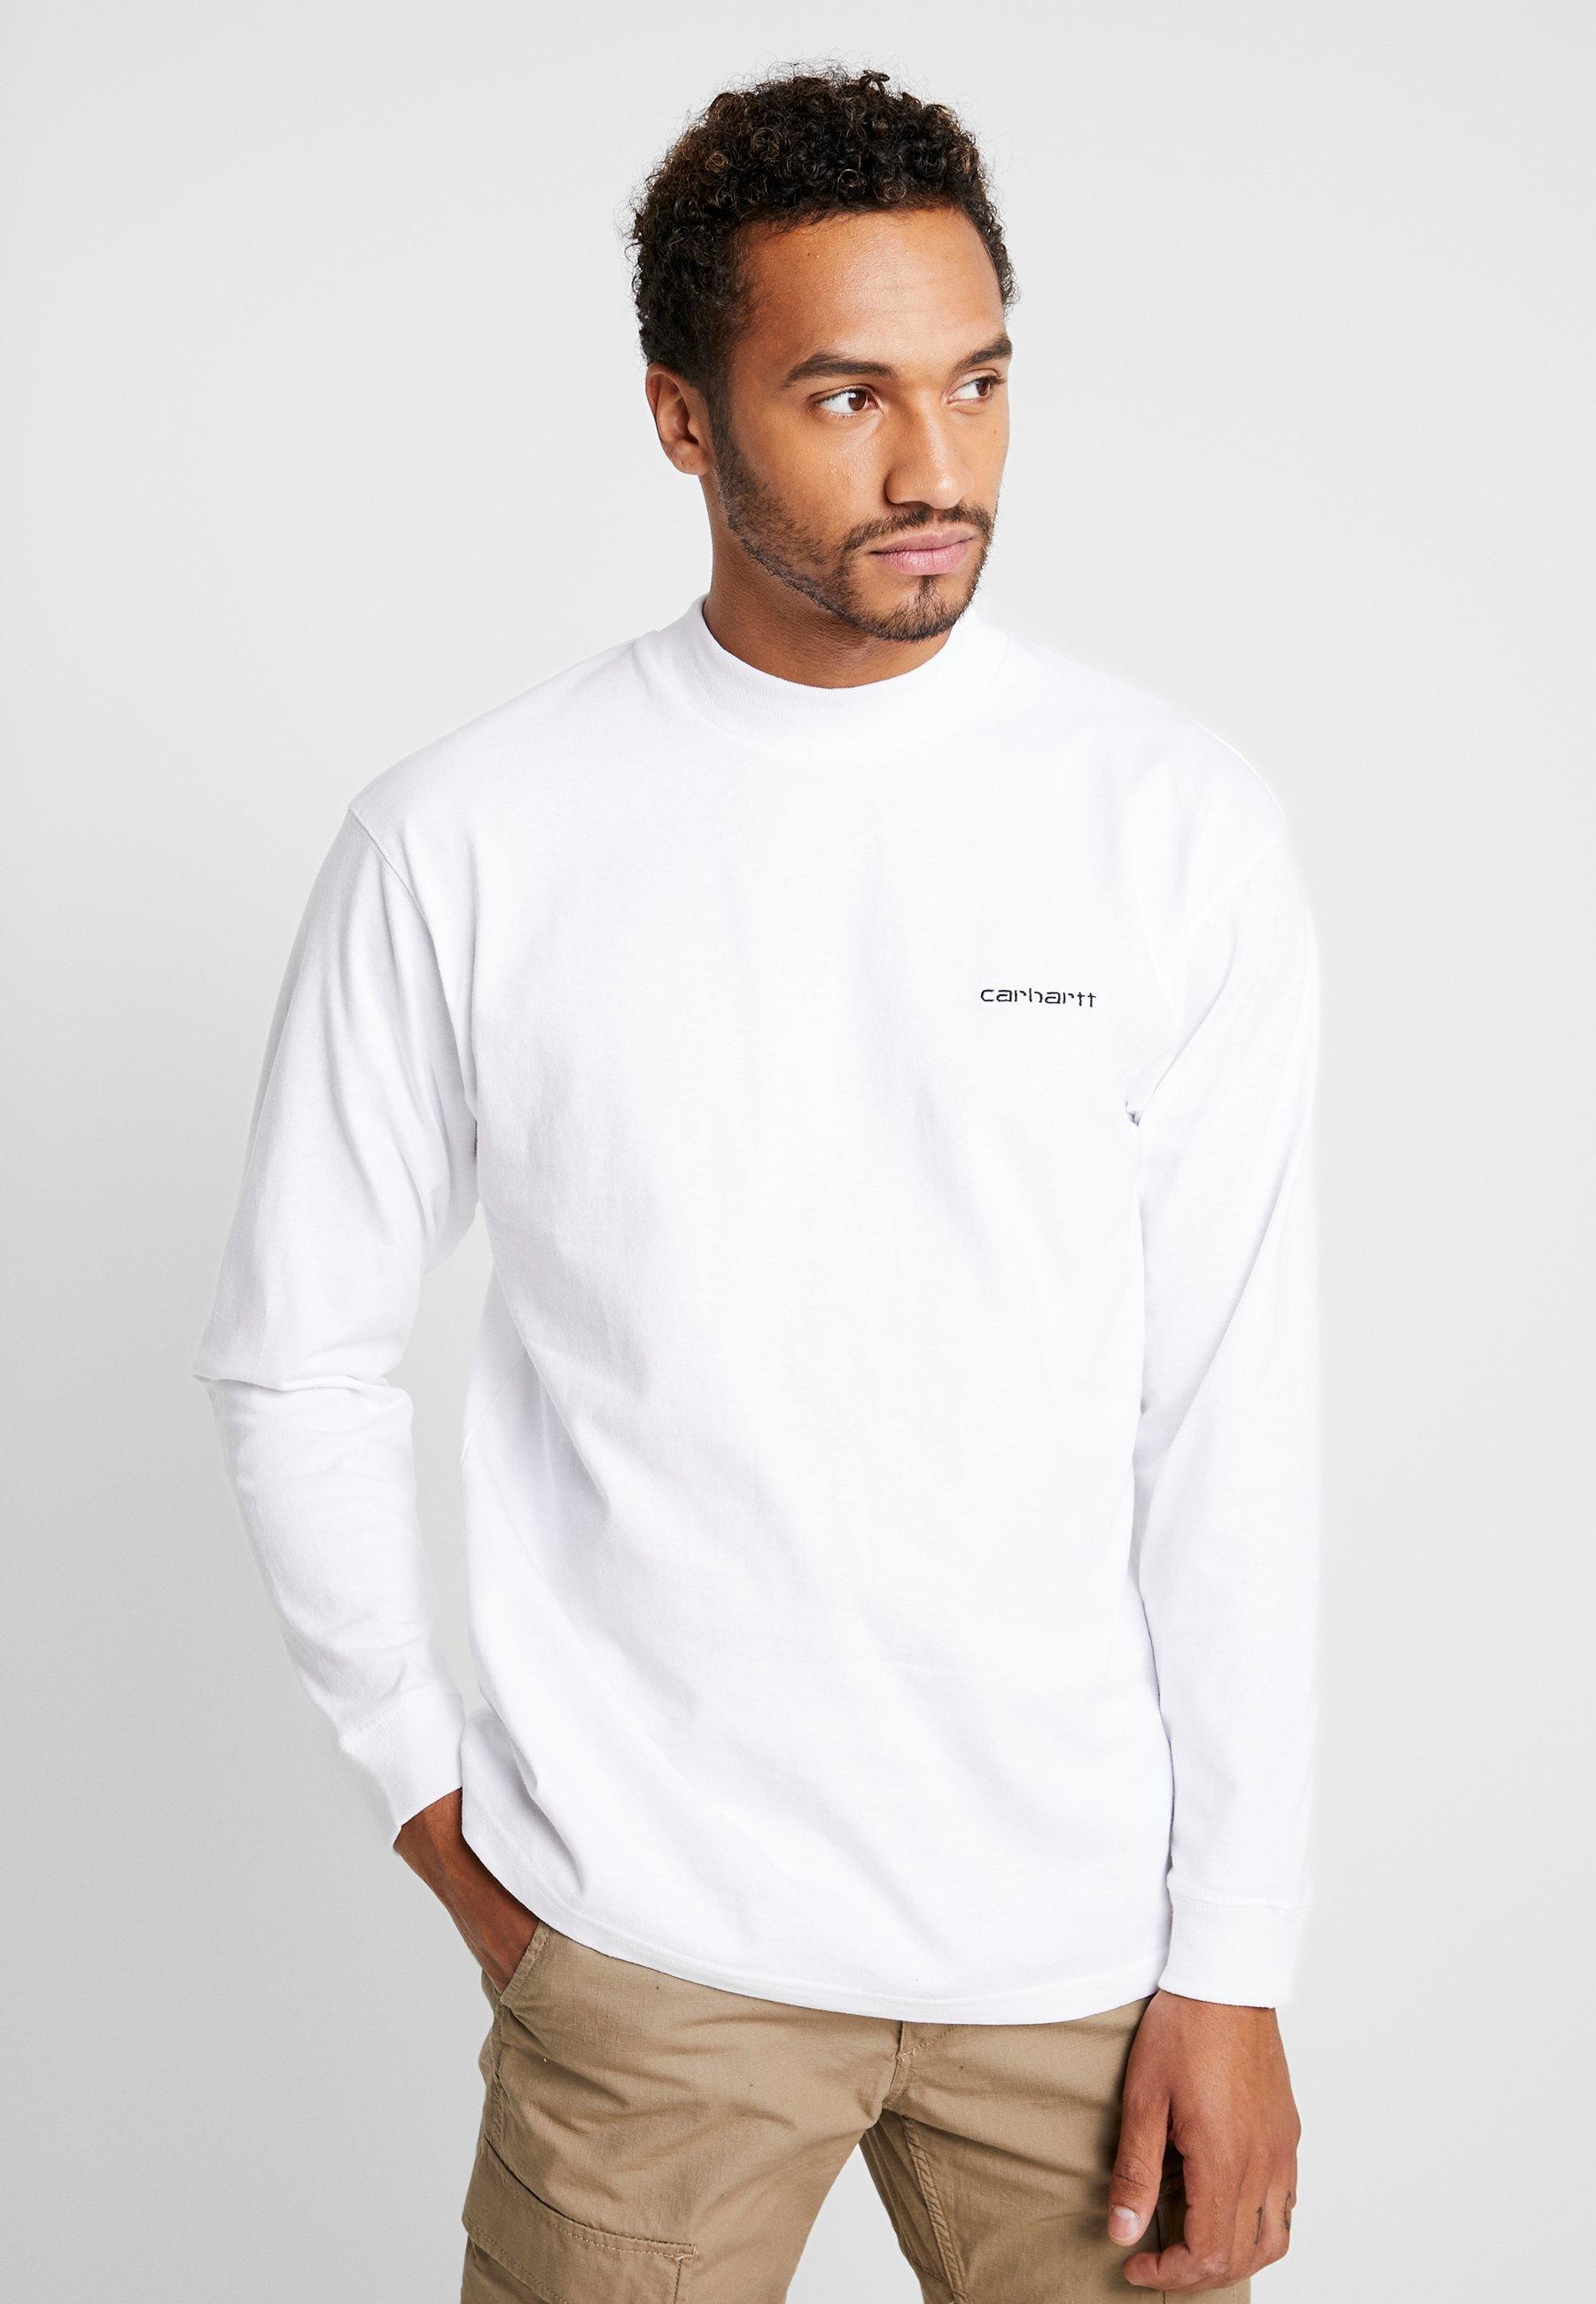 EmbroideryT shirt White À Manches Script Longues Wip Carhartt black Mockneck v0nywNmO8